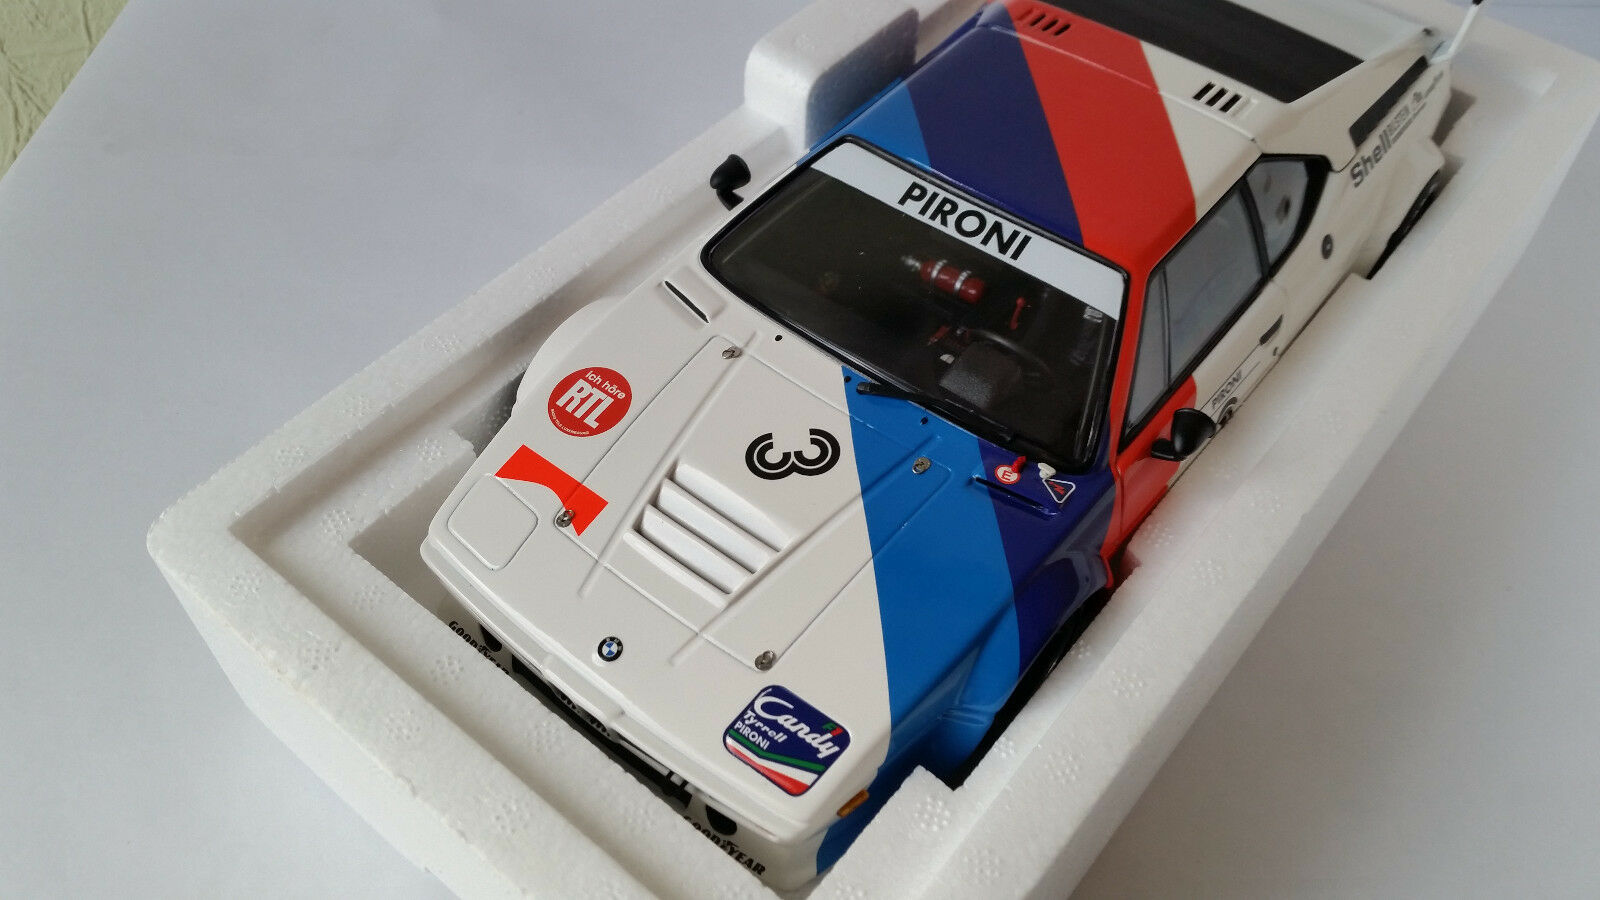 1 18 Minichamps BMW m1 BMW Motorsport Procar Series D. PIRONI 79' Lim. Ed neuf dans sa boîte En parfait état, dans sa boîte